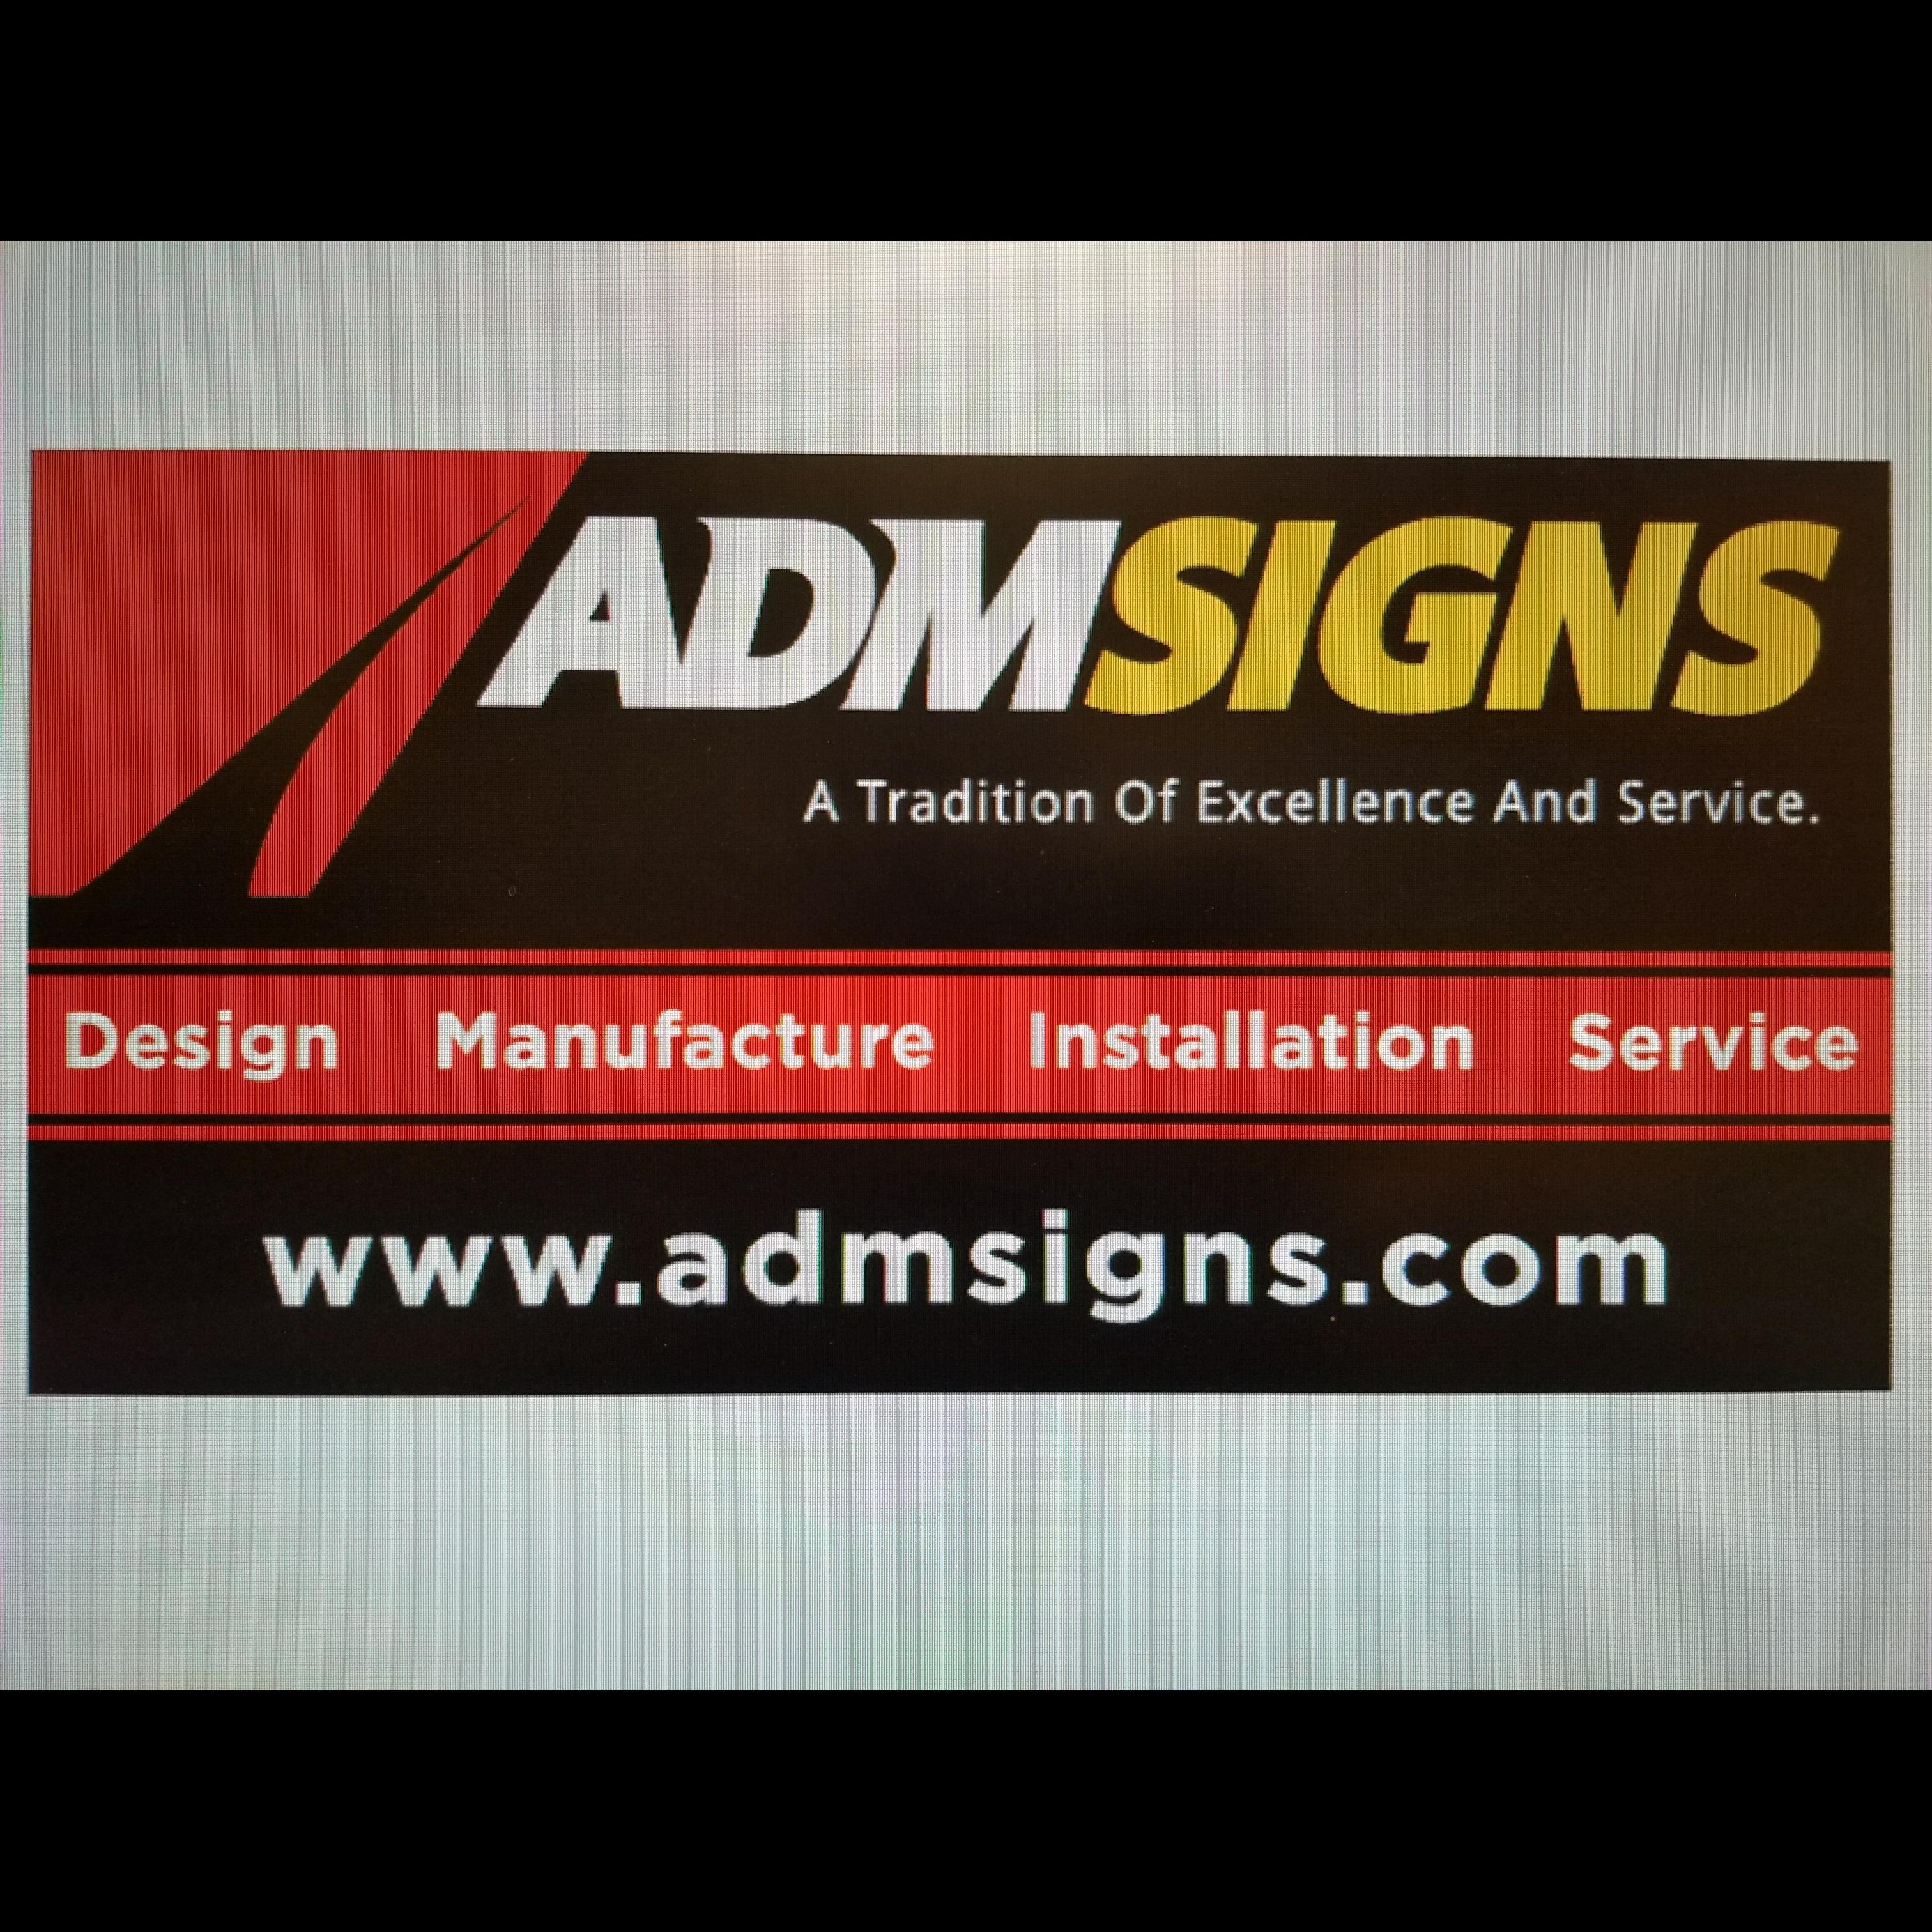 ADM Signs